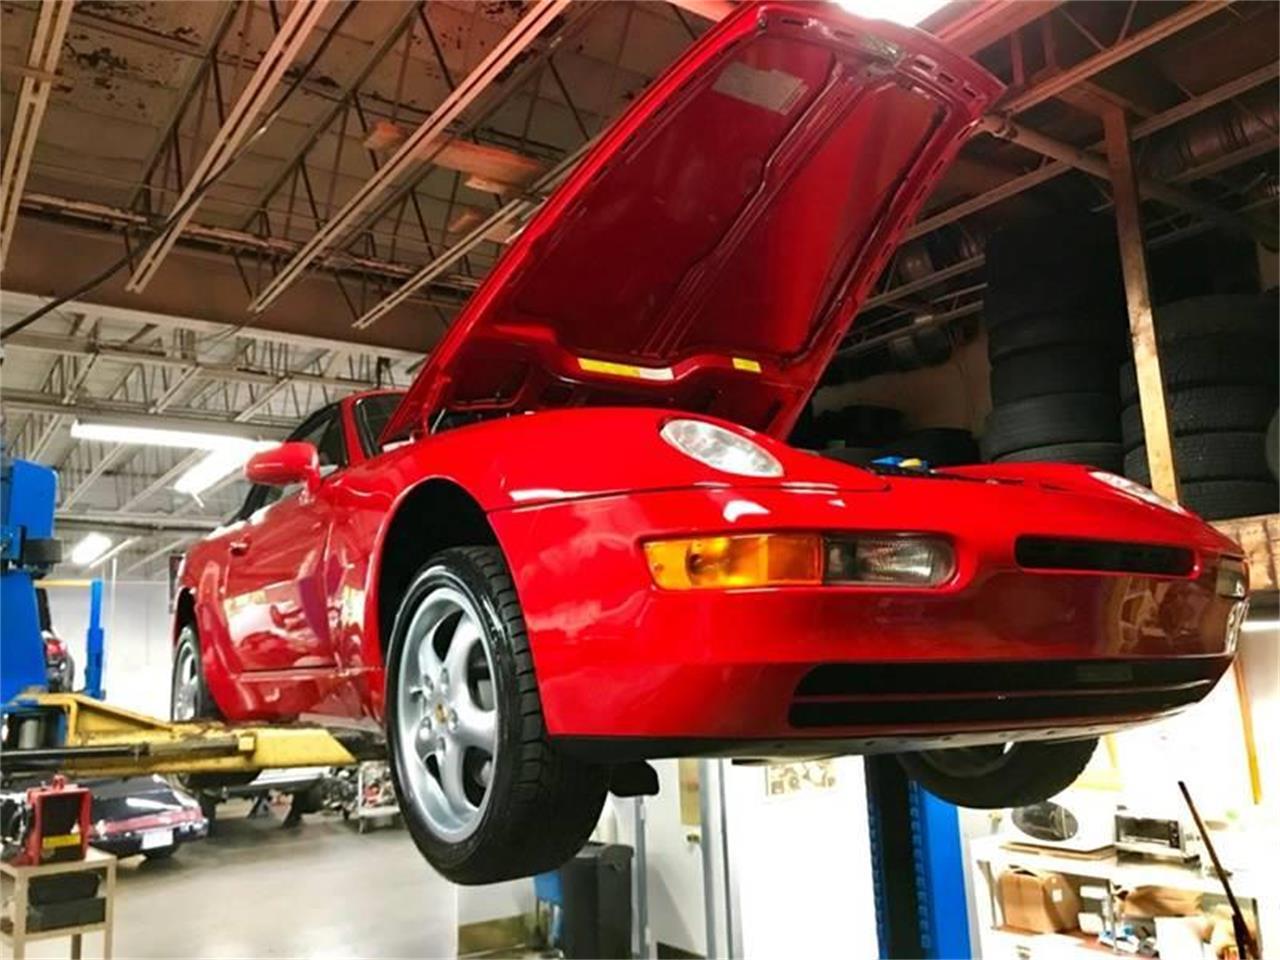 1995 Porsche 968 (CC-1298175) for sale in Marietta, Georgia